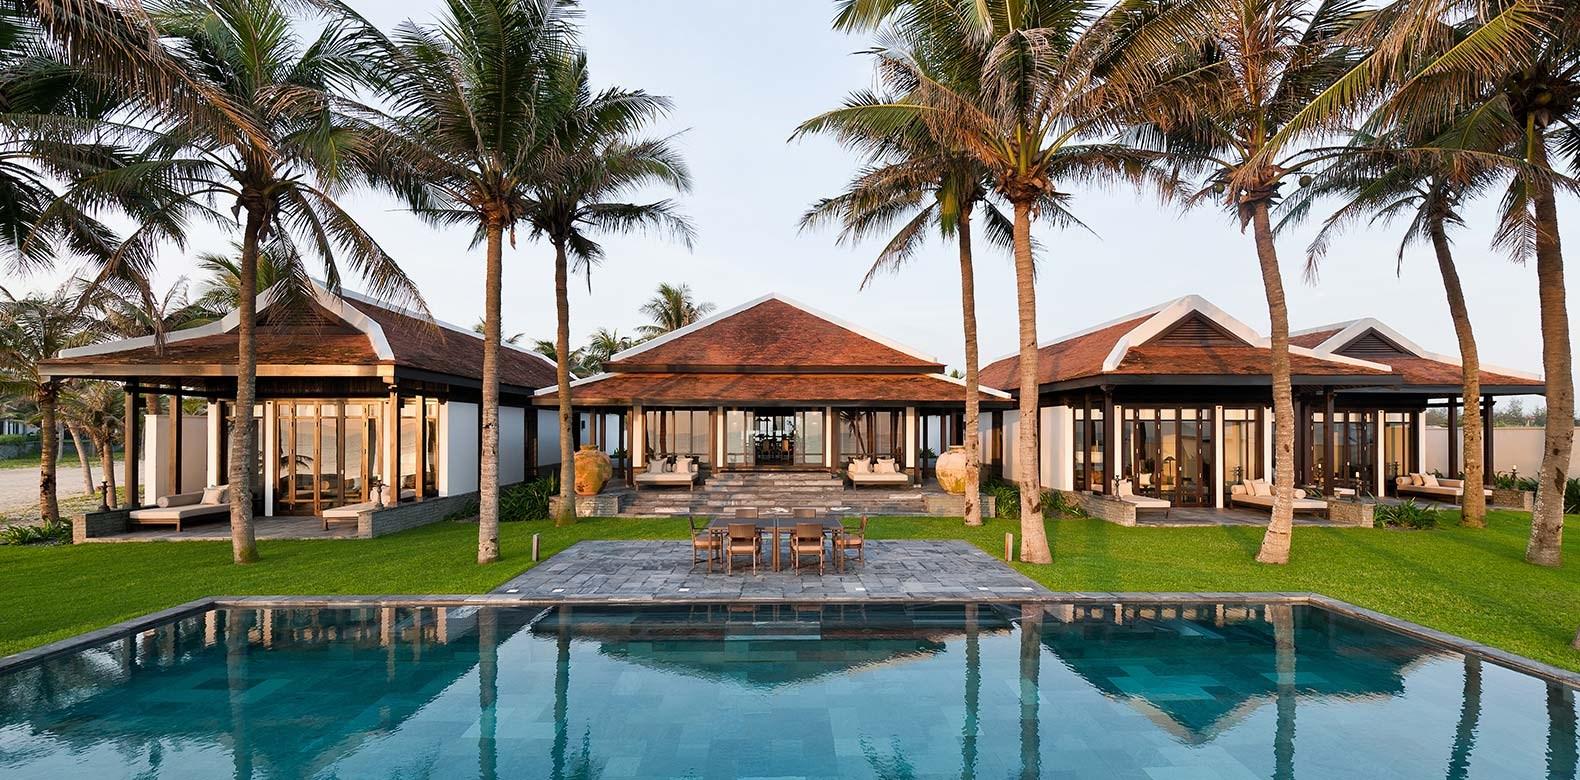 Hotels in Hoian